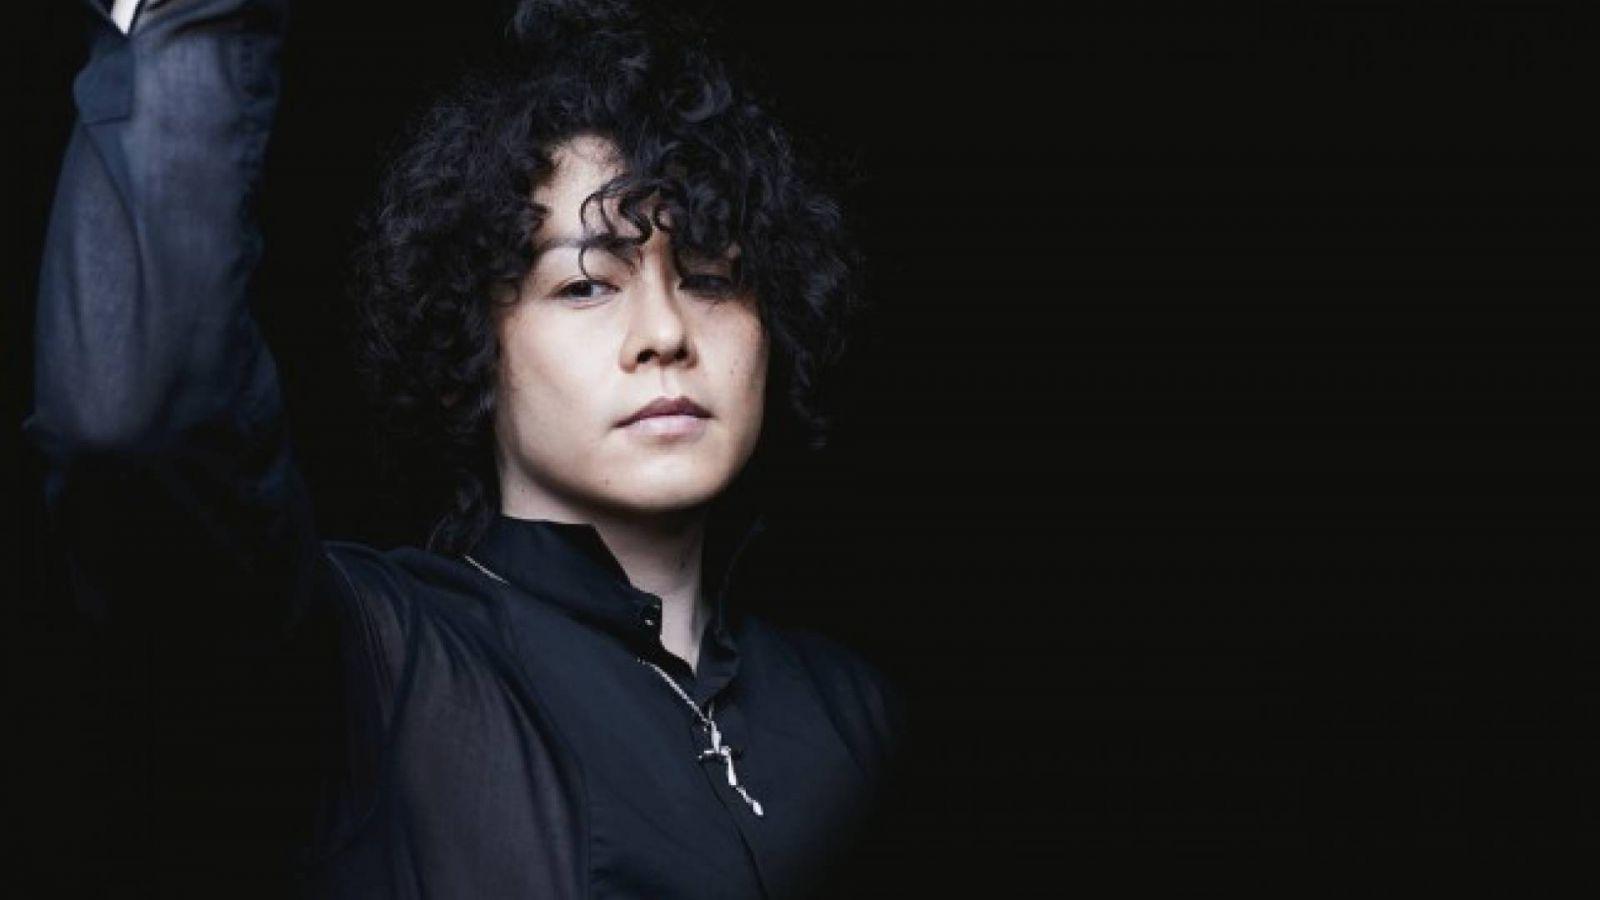 Kawamura Ryuichi anuncia novo single após 2 anos © Avex Entertainment Inc.